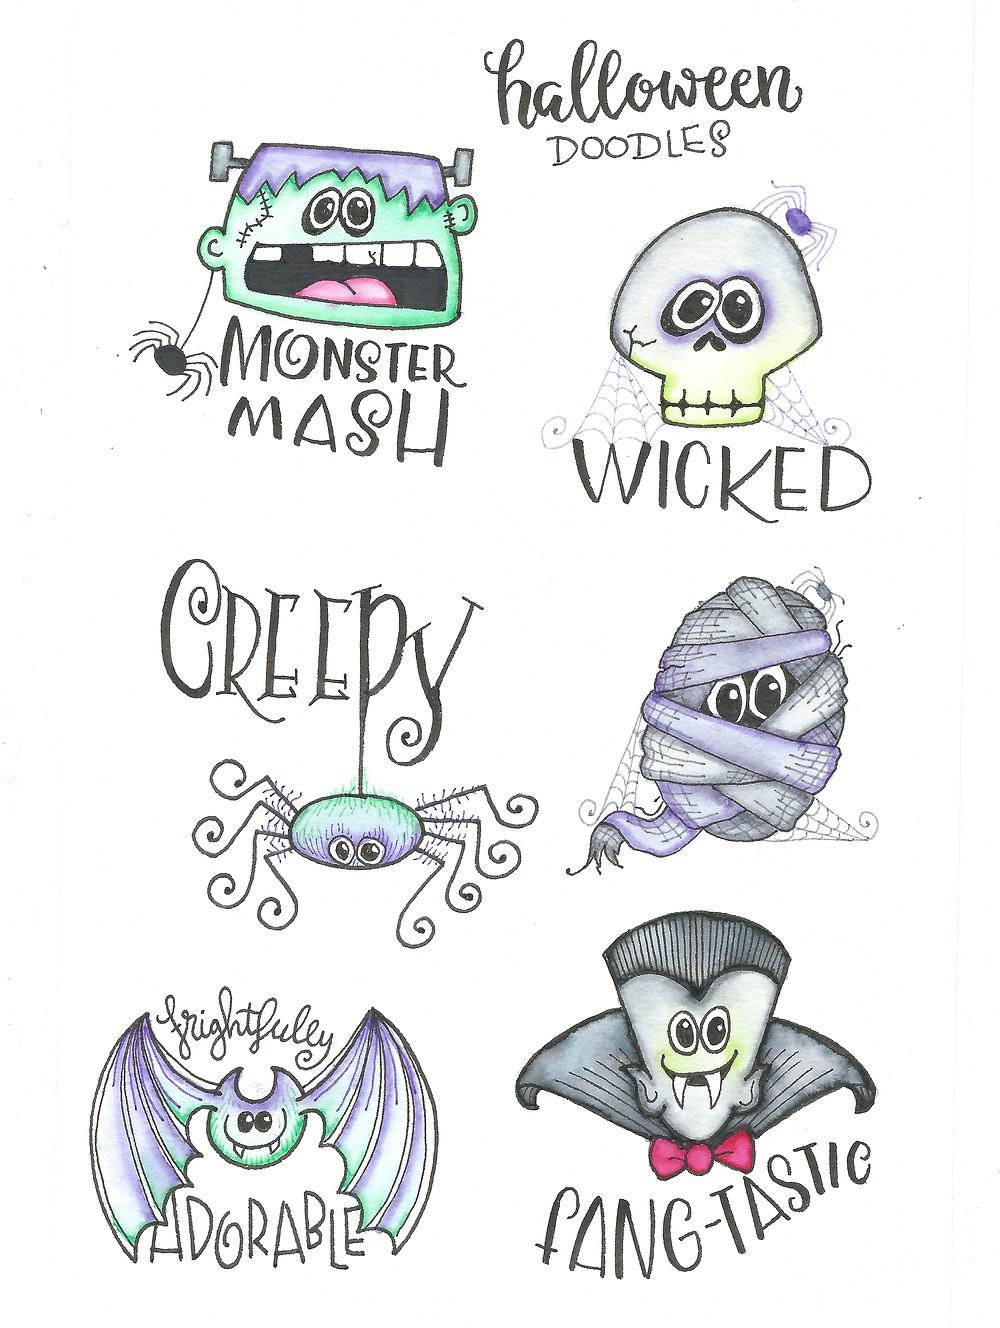 More halloween doodles @mariebrowning #halloween #drawing